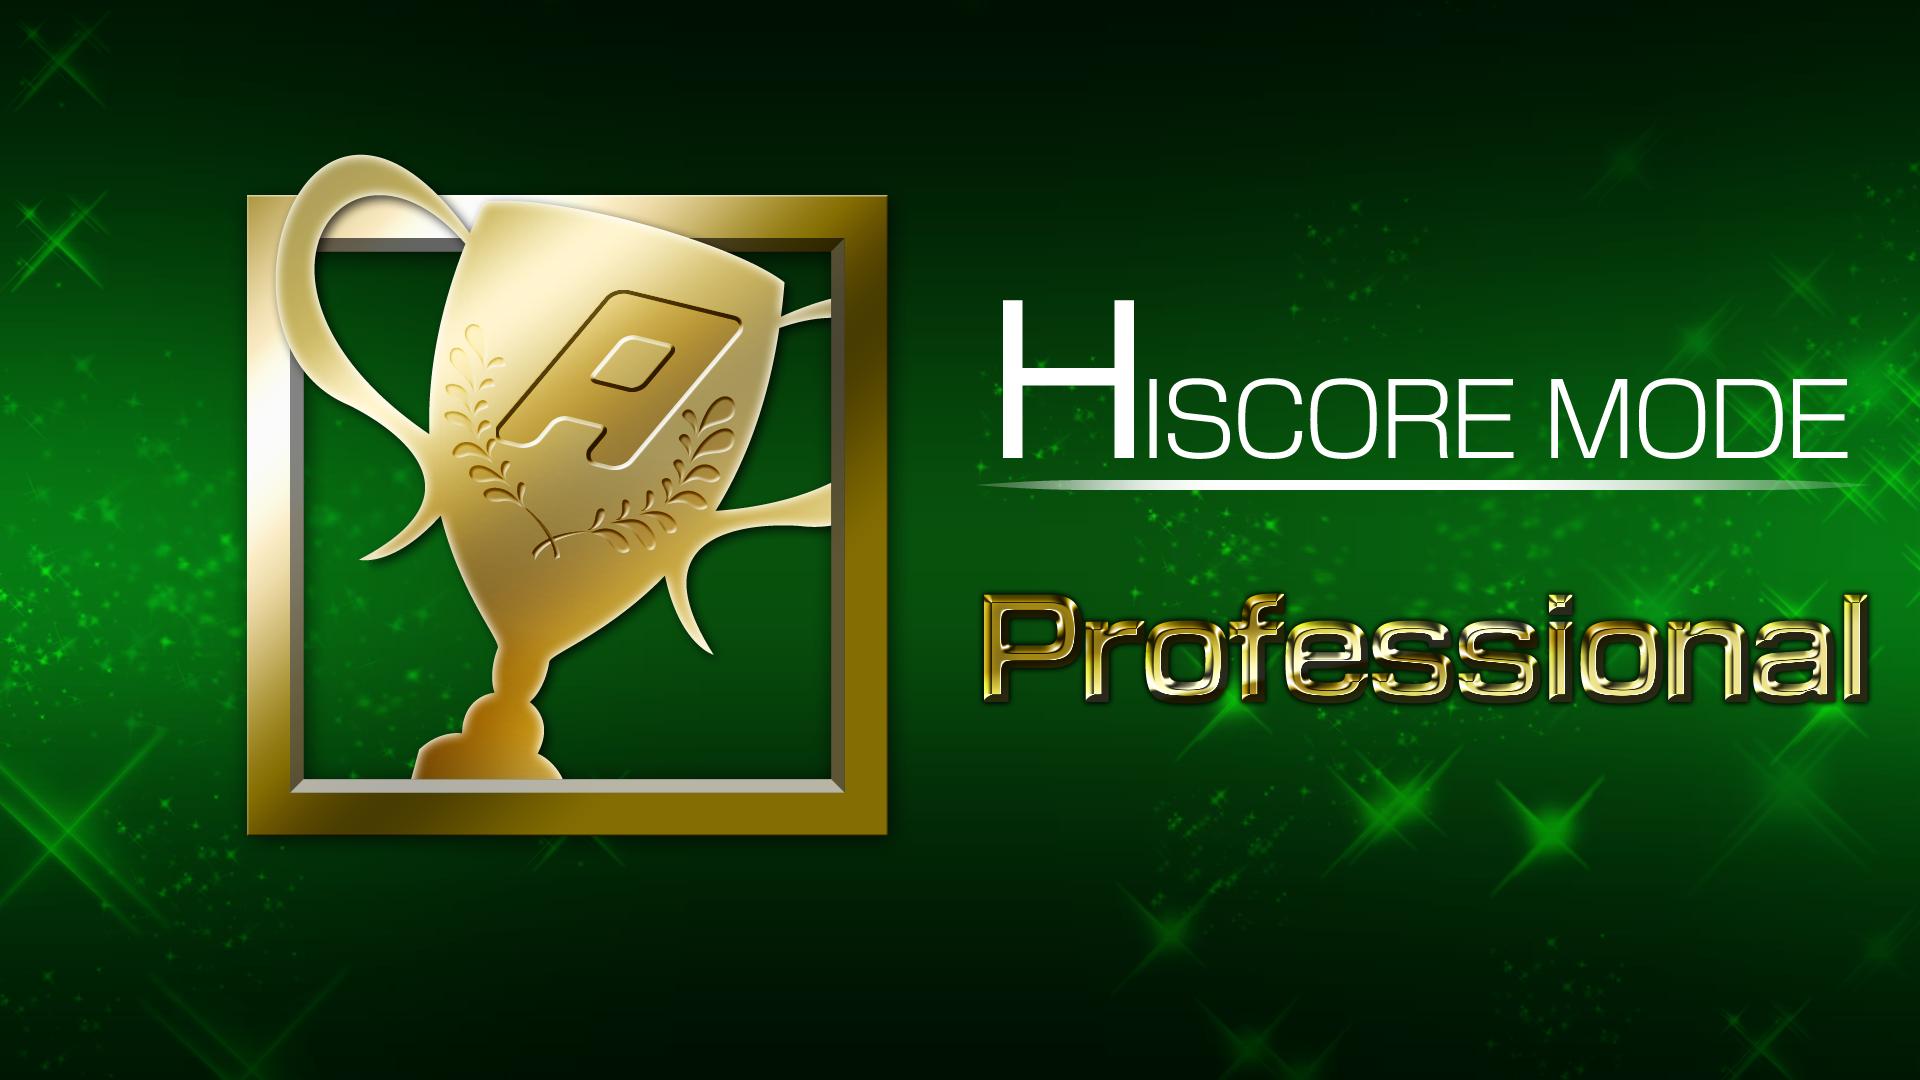 Icon for HI SCORE MODE 15,000 points